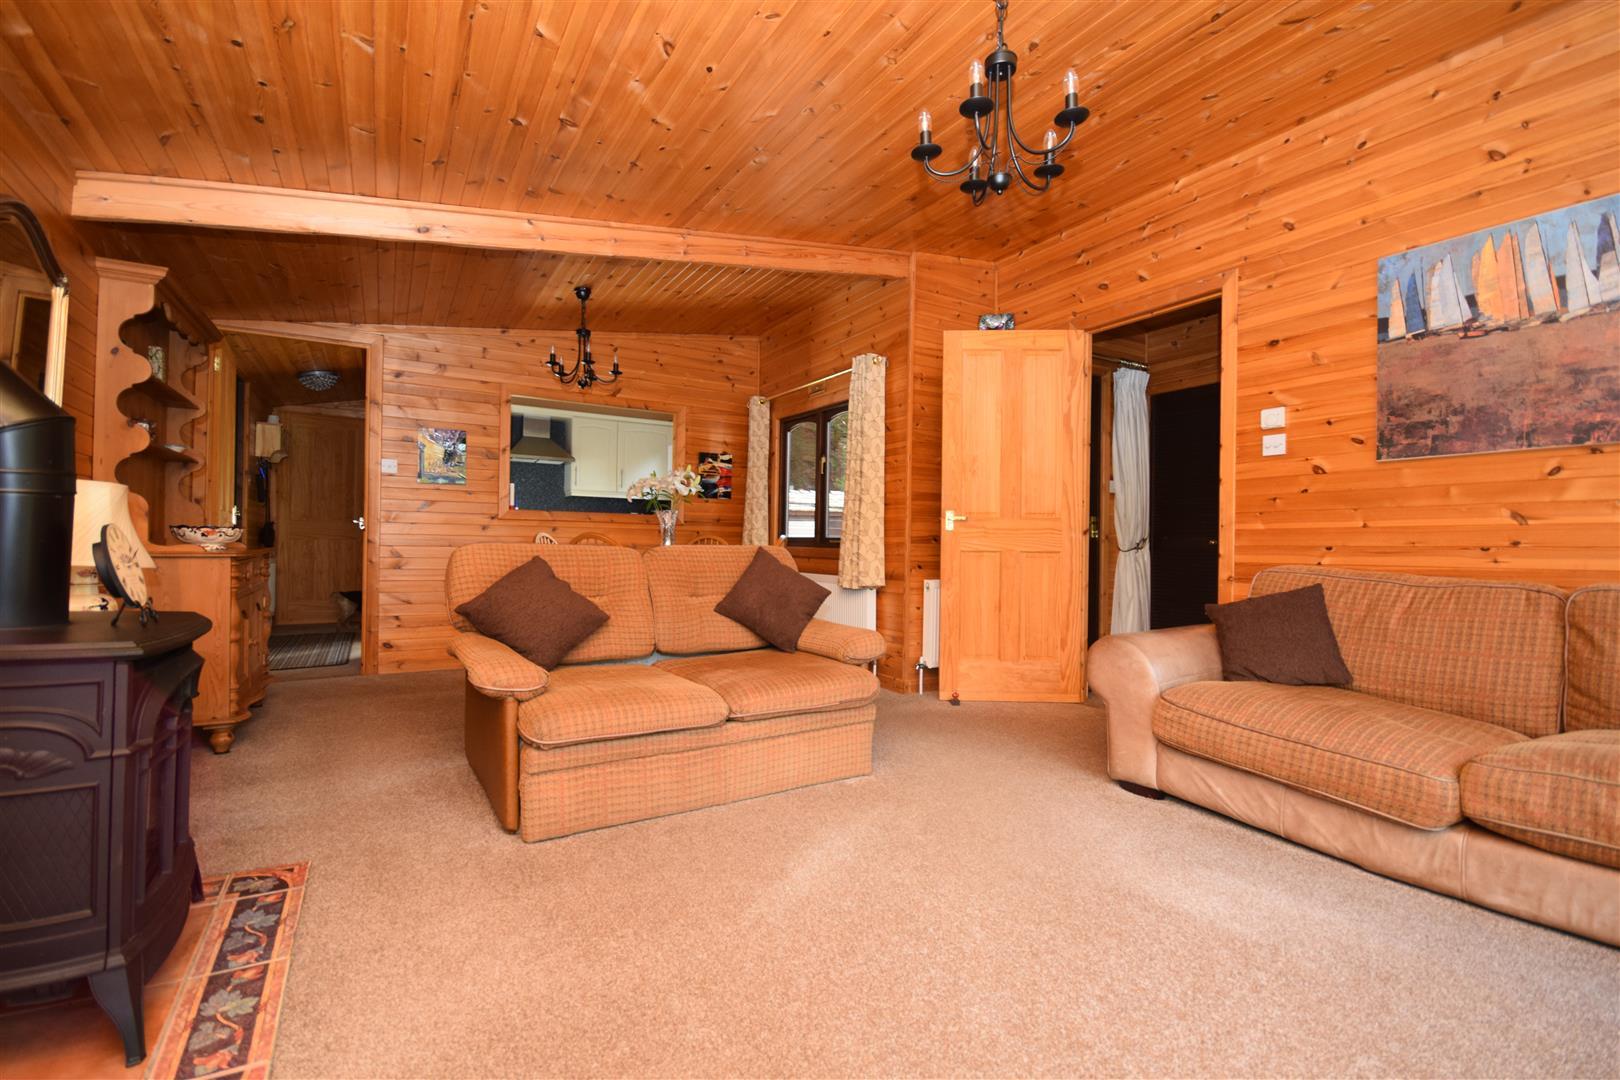 Pine Lodge, River Tilt Caravan Park, Invertilt Road, Bridge Of Tilt, Pitlochry, Perthshire, PH18 5TE, UK